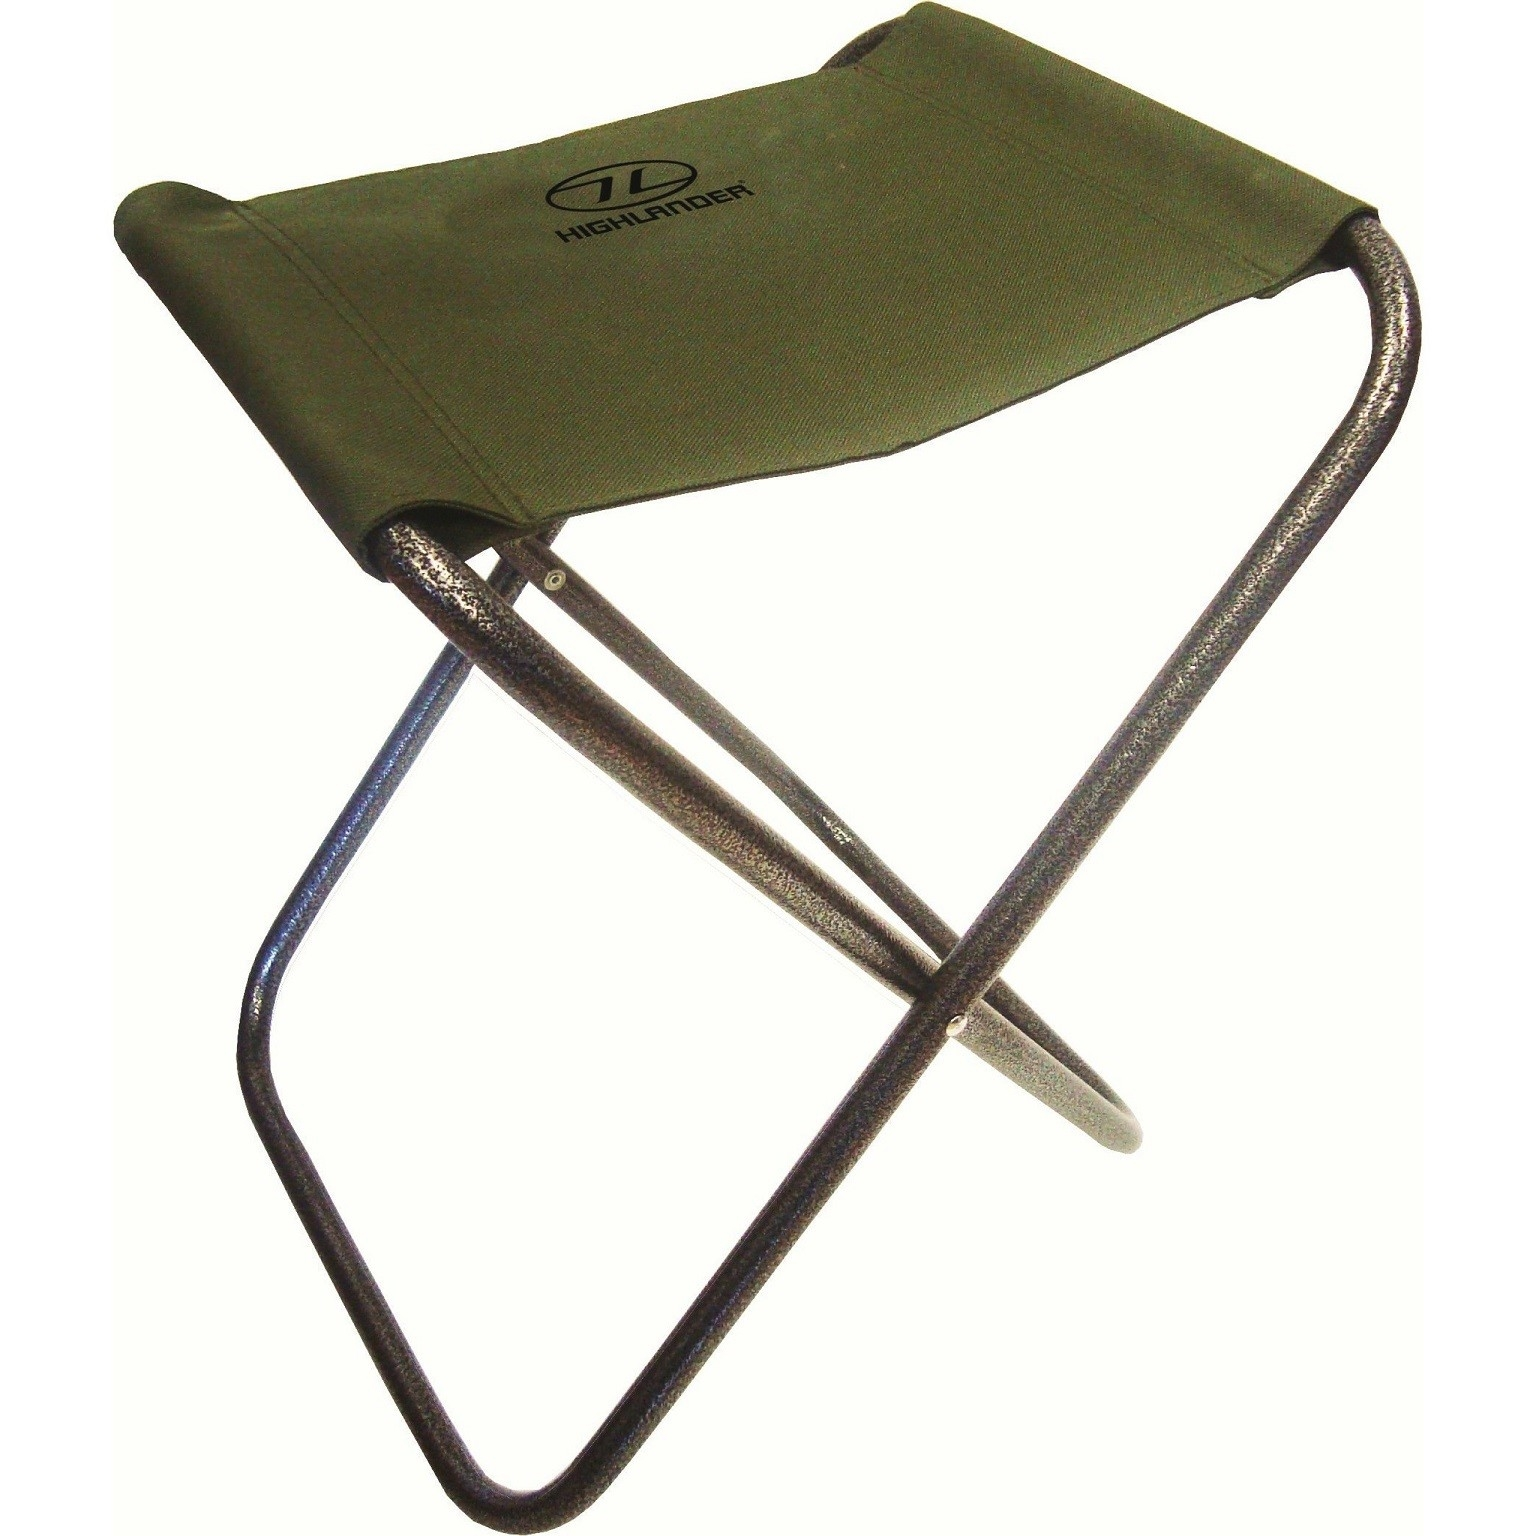 Highlander Fishing Stool Folding Seat Camping Festival Travel Mens